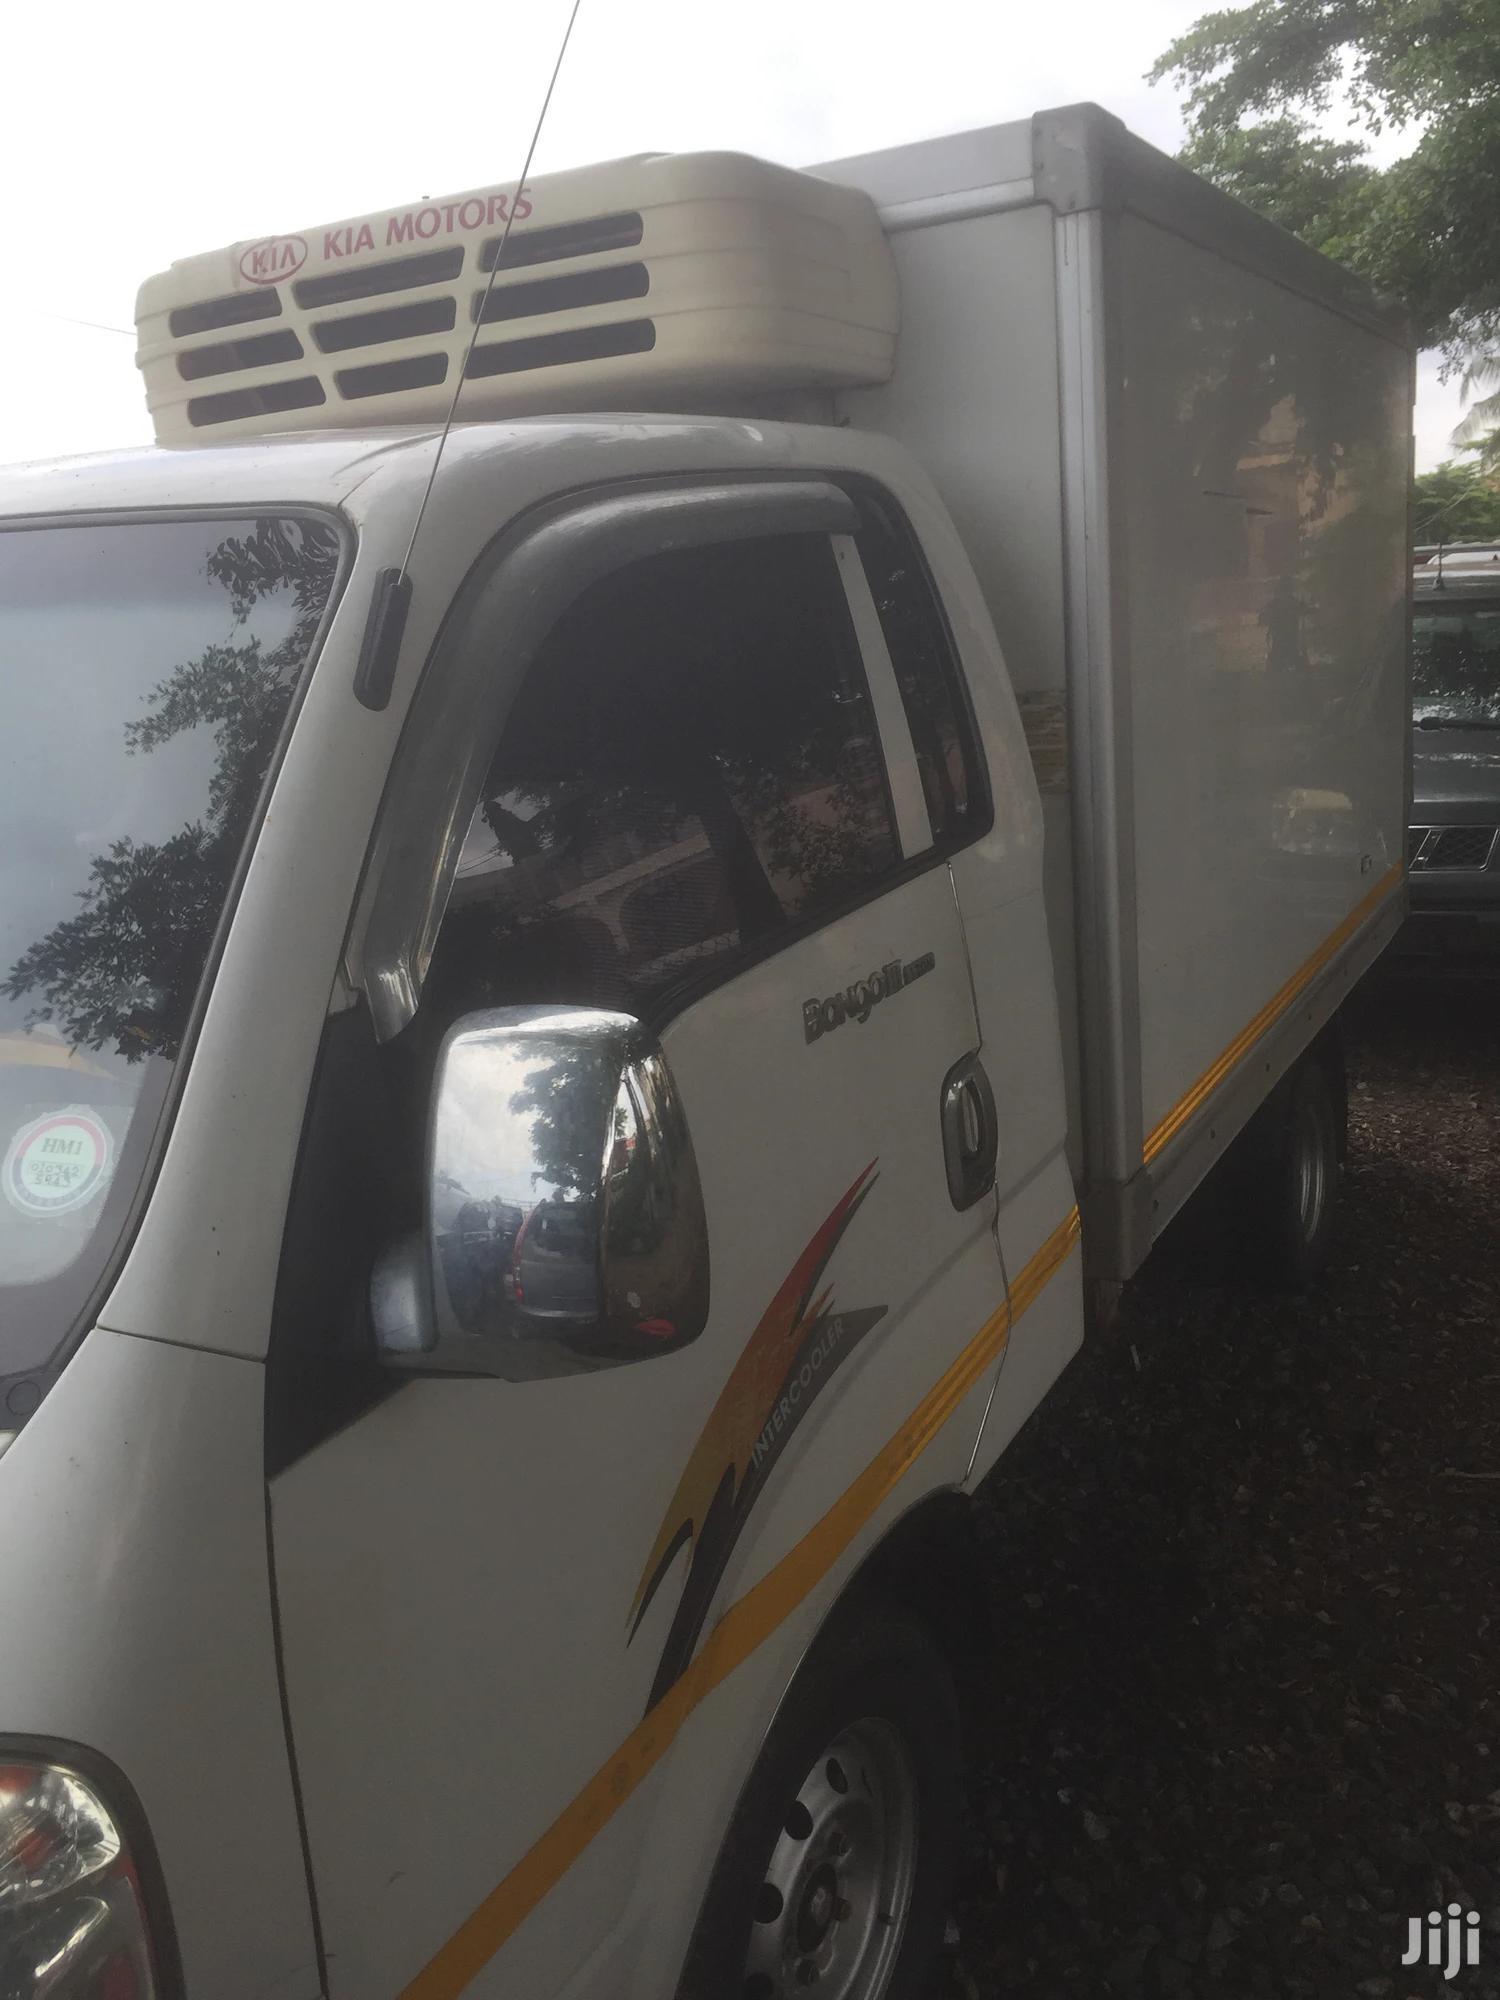 KIA BONGO III 2004 For Sale   Trucks & Trailers for sale in Tema Metropolitan, Greater Accra, Ghana